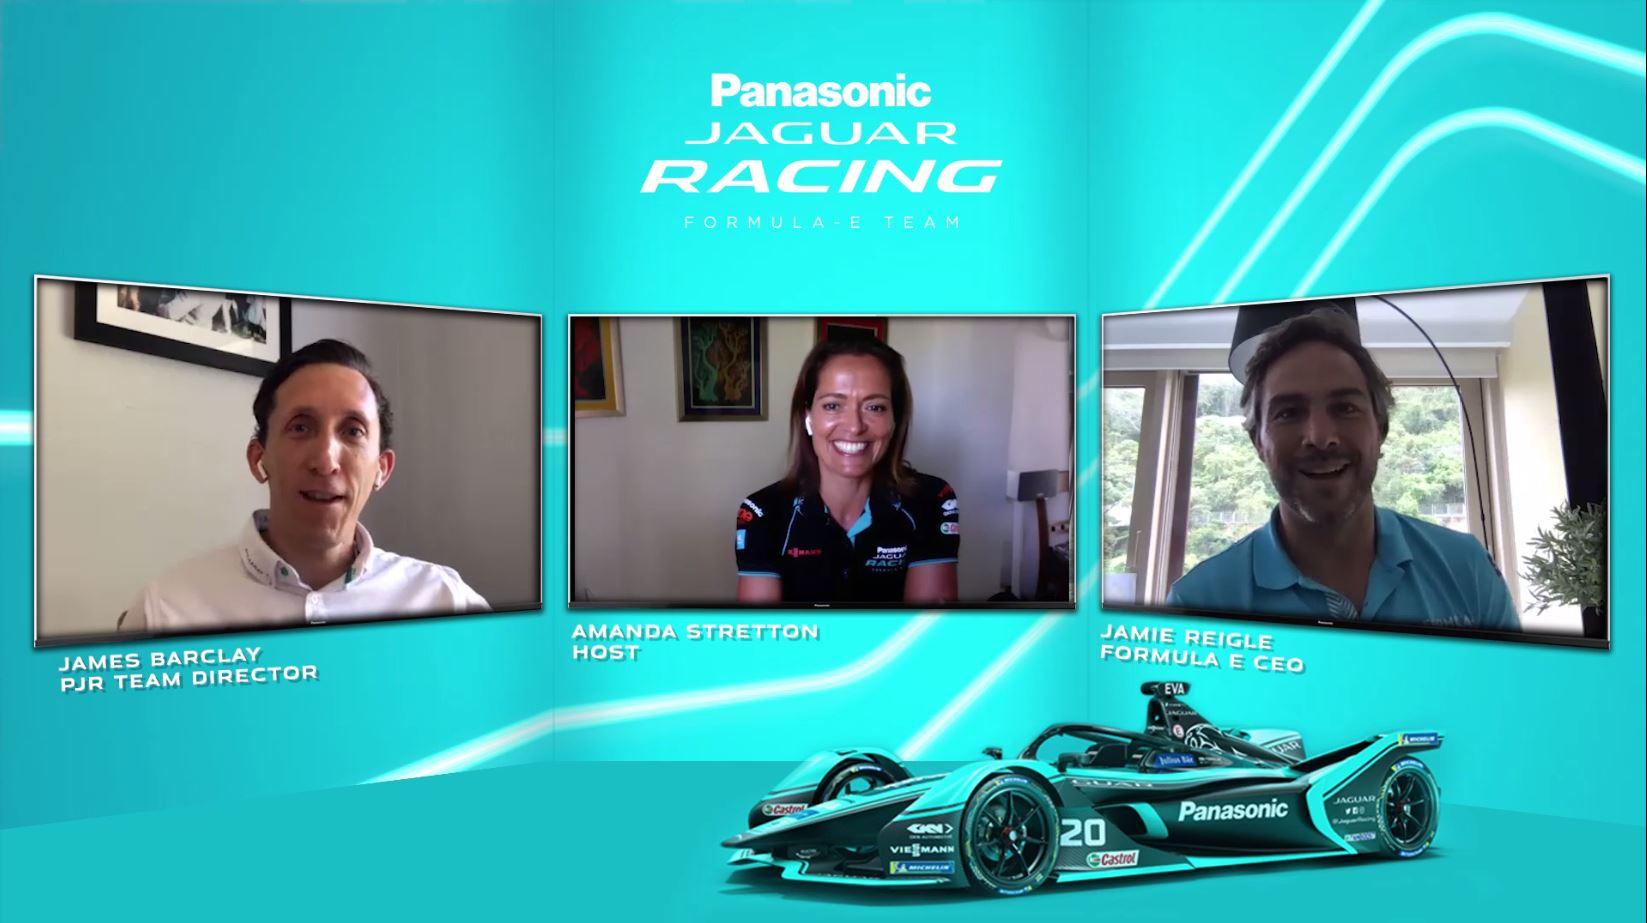 FORMULA E CEO JAMIE REIGLE JOINS RE:CHARGE @ HOME - PANASONIC JAGUAR RACING'S VIDEO PODCAST SERIES